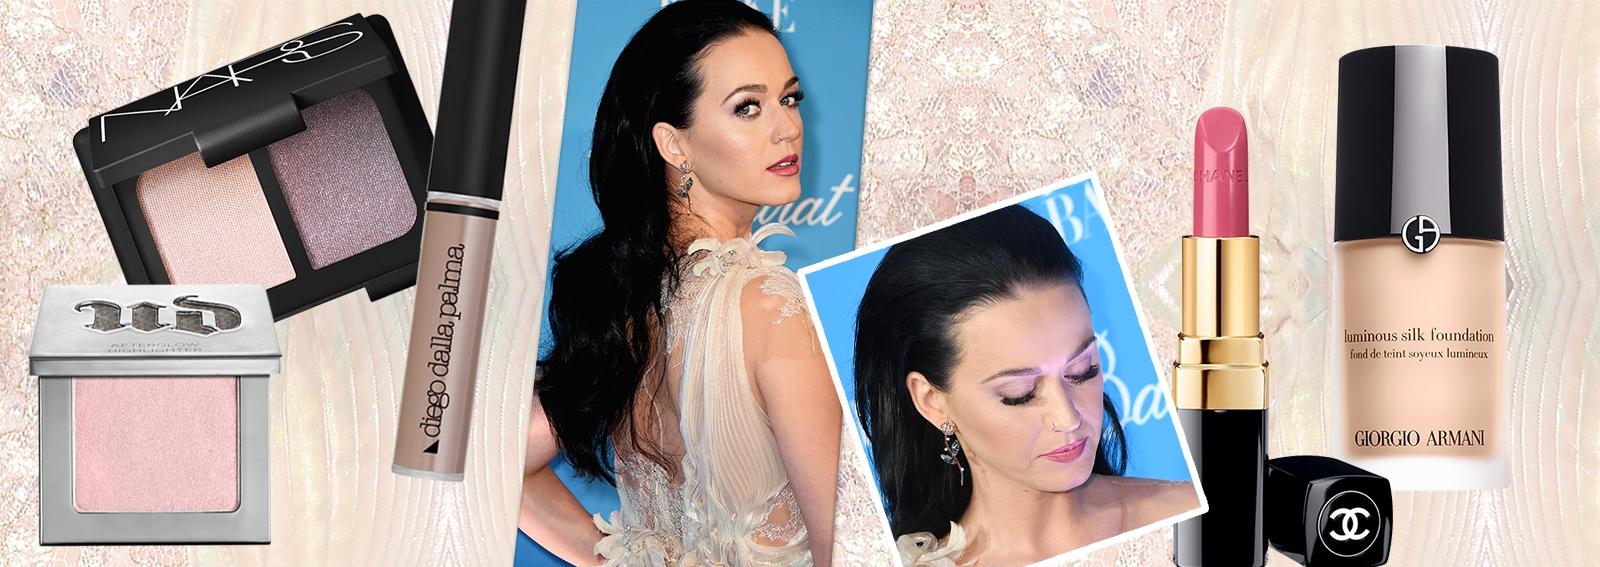 katy-perry-copia-il-make-up--collage-desktop